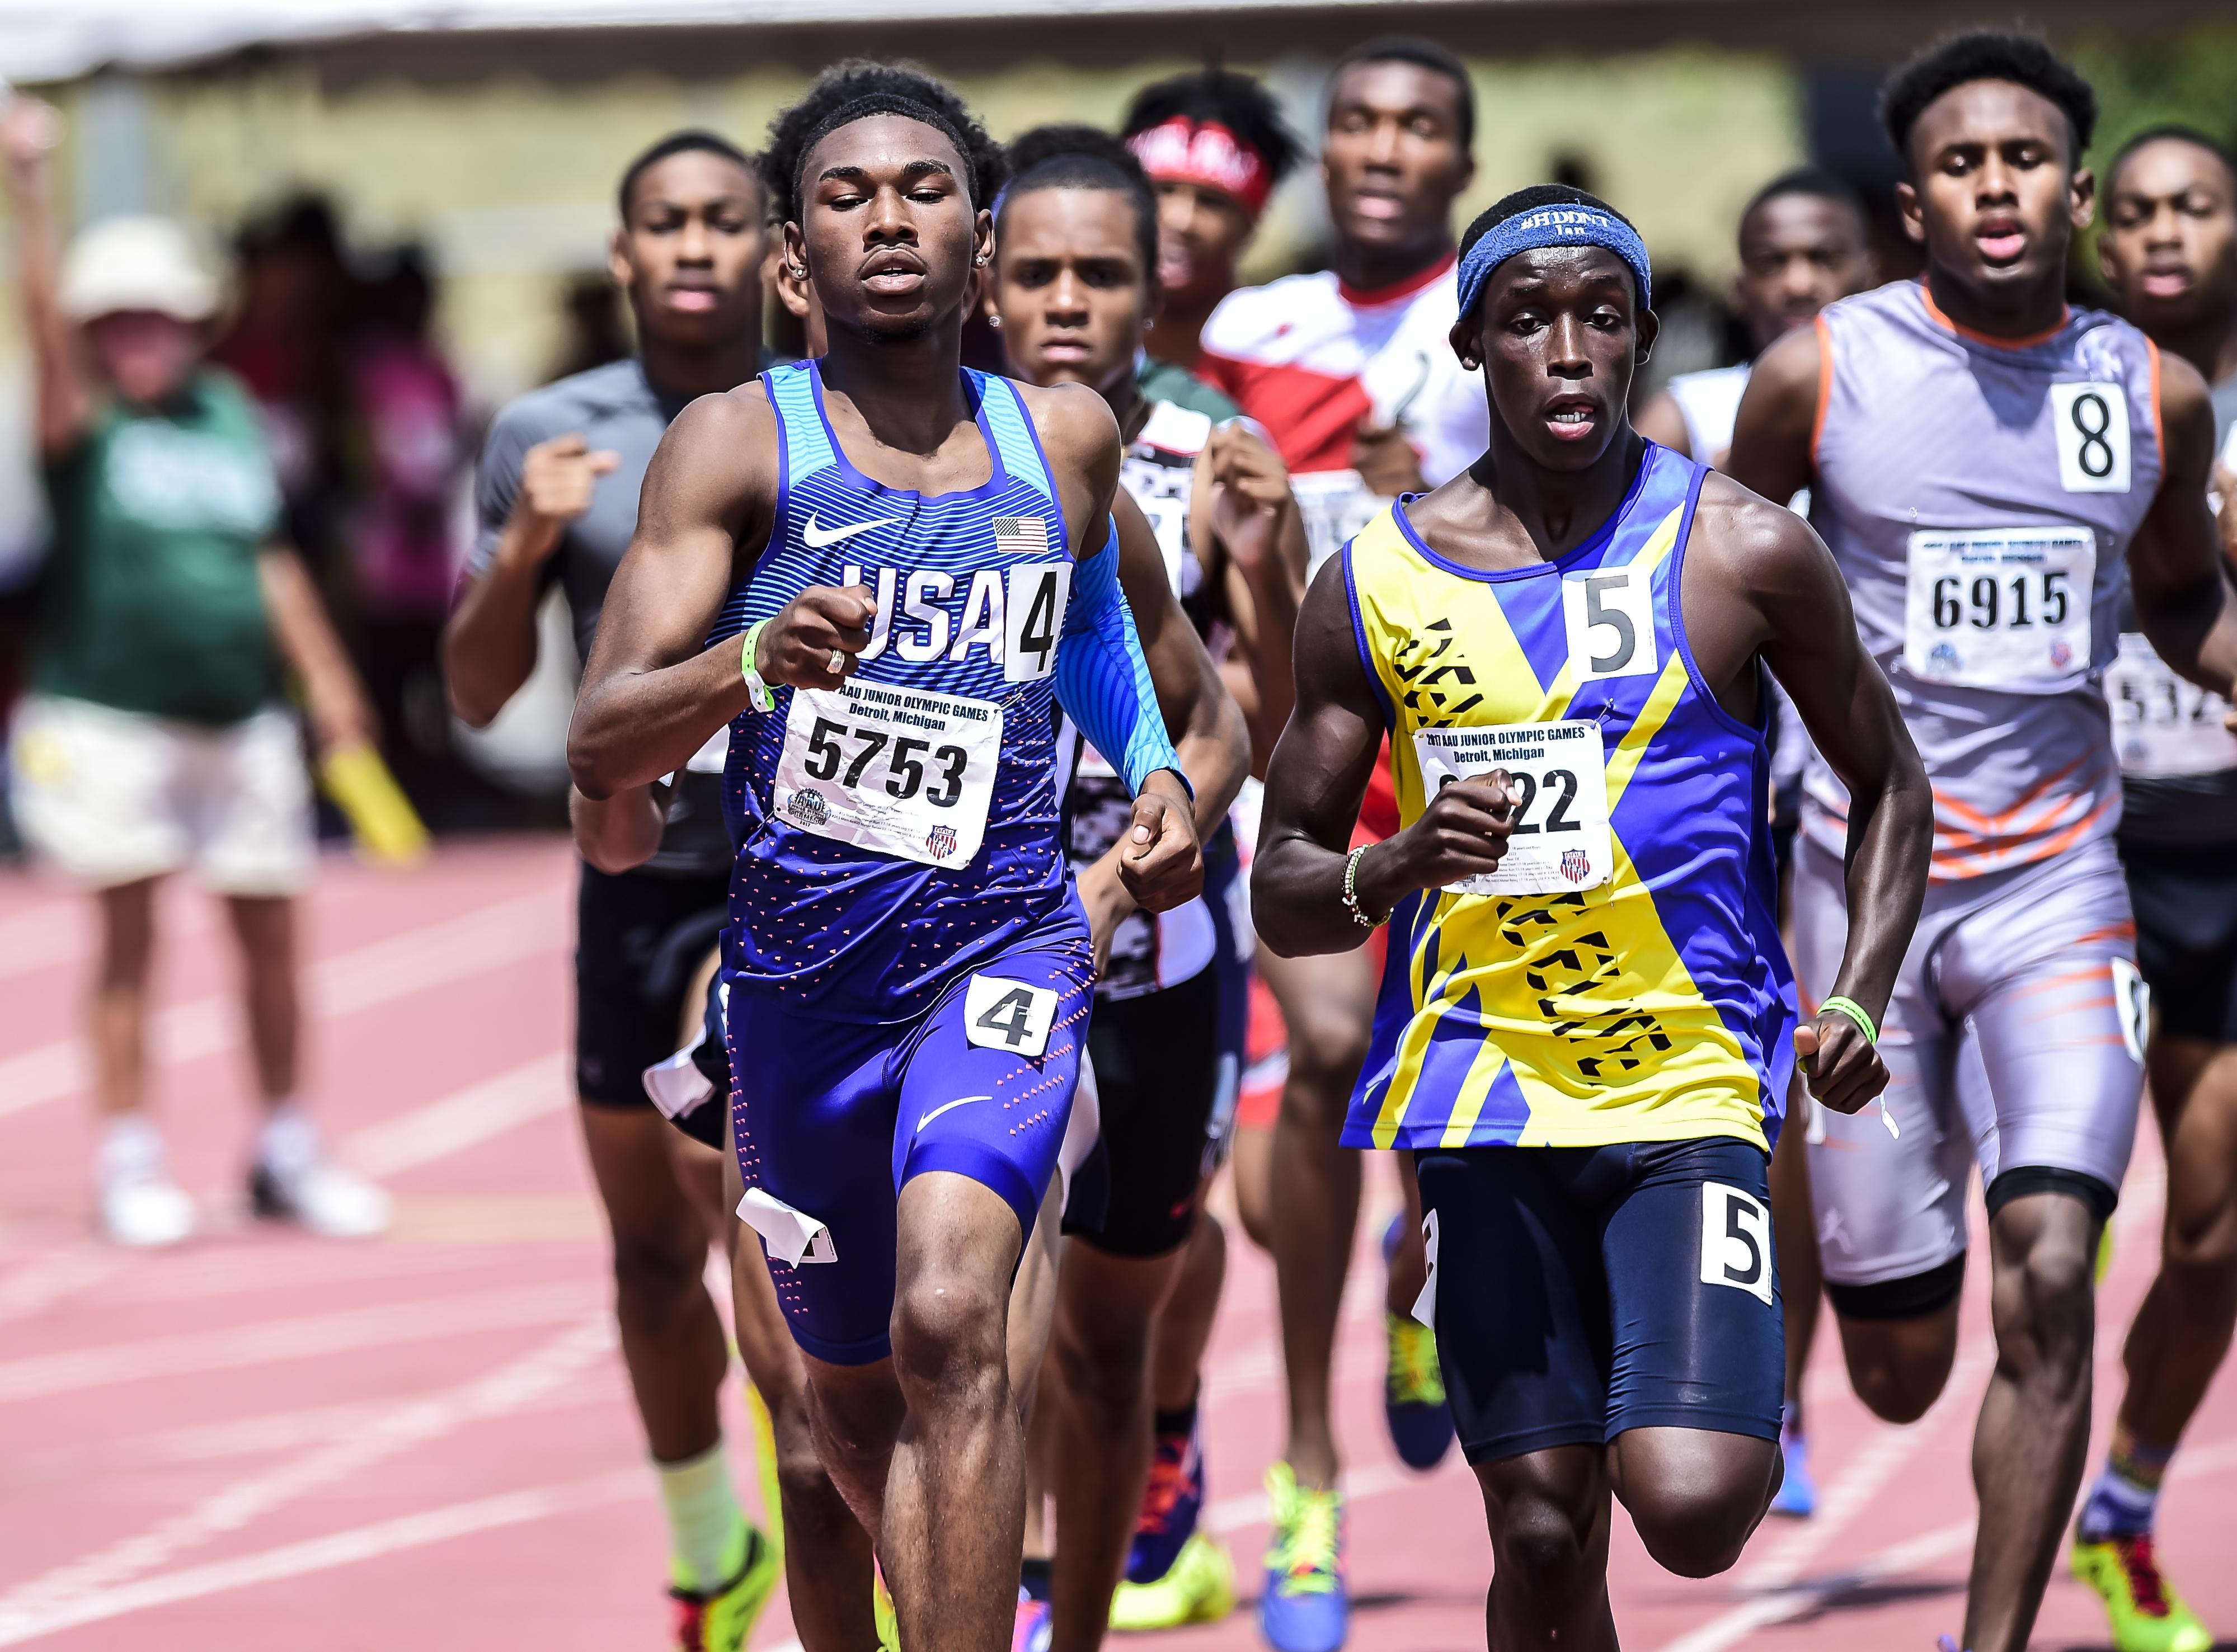 USATF Hershey National Junior Olympic Track